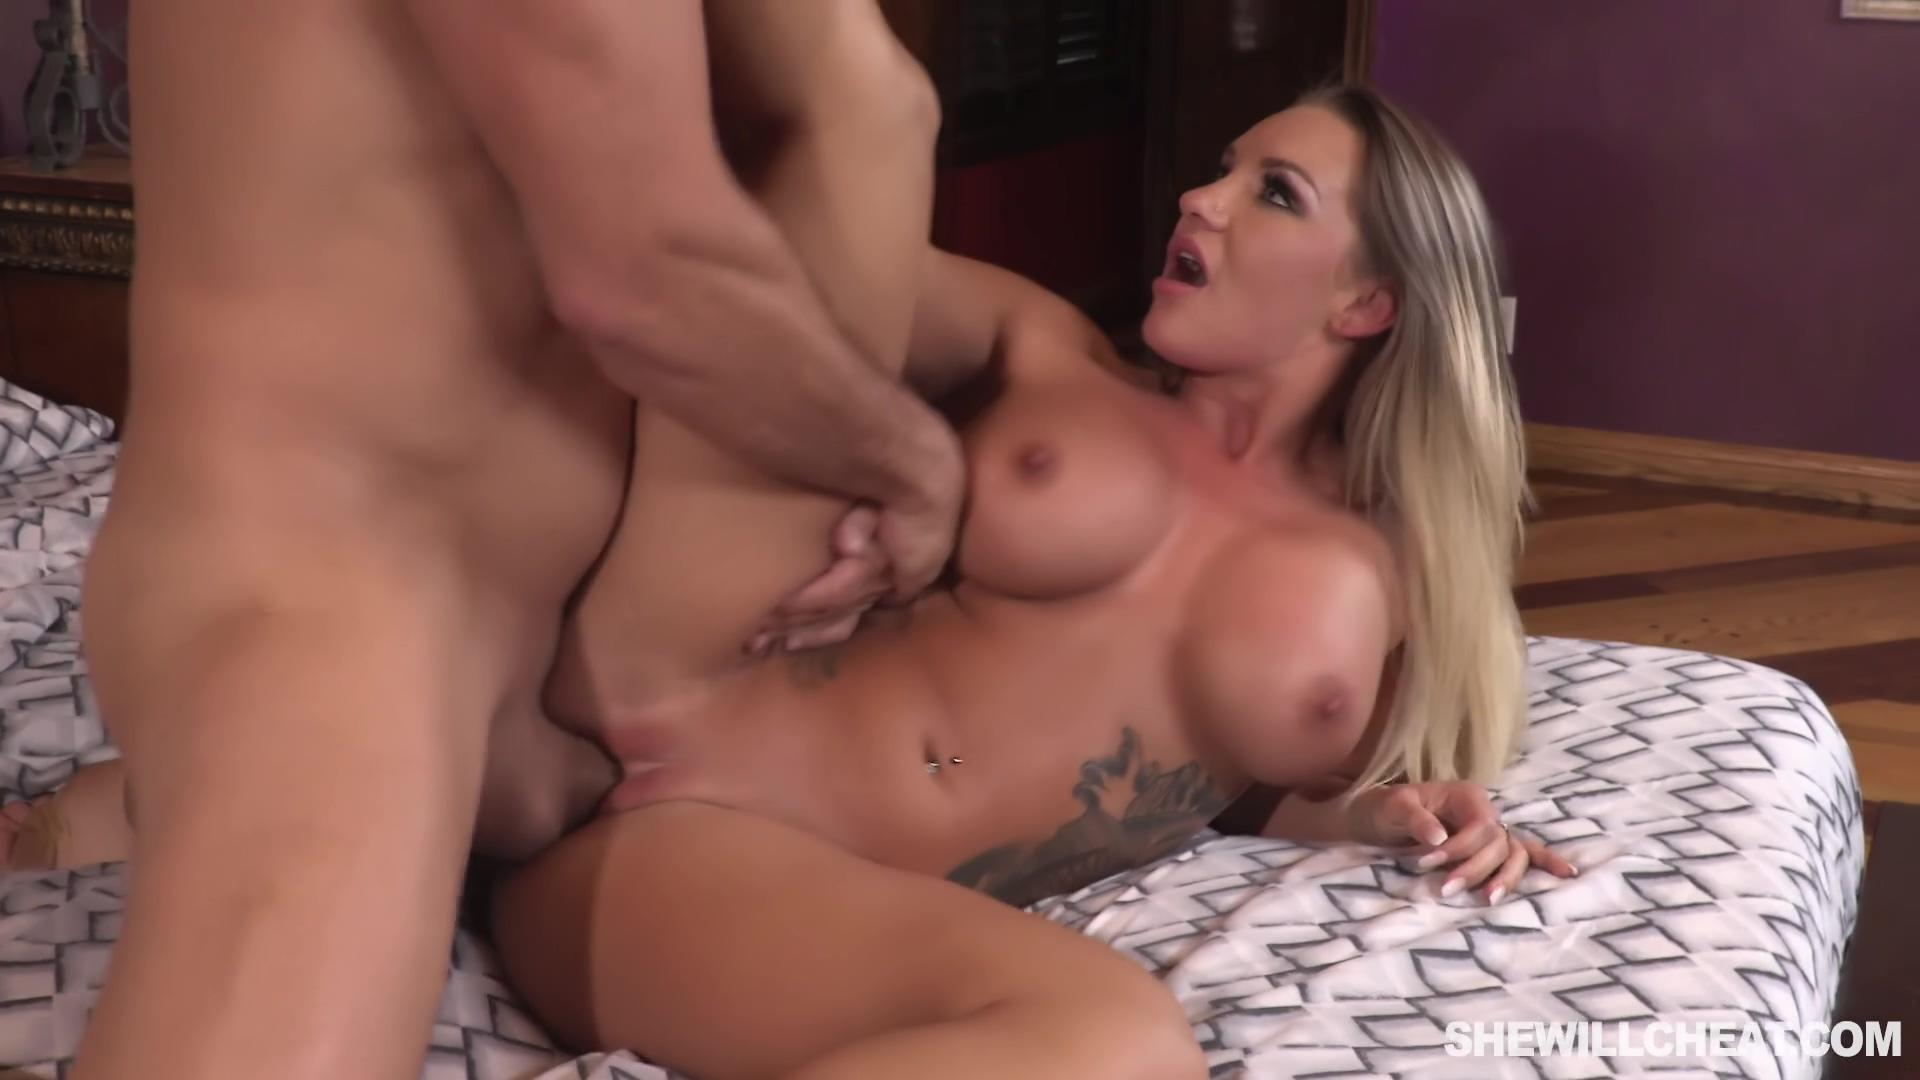 Anal Lover Cali Carter Cucks Her Husband Over Phone